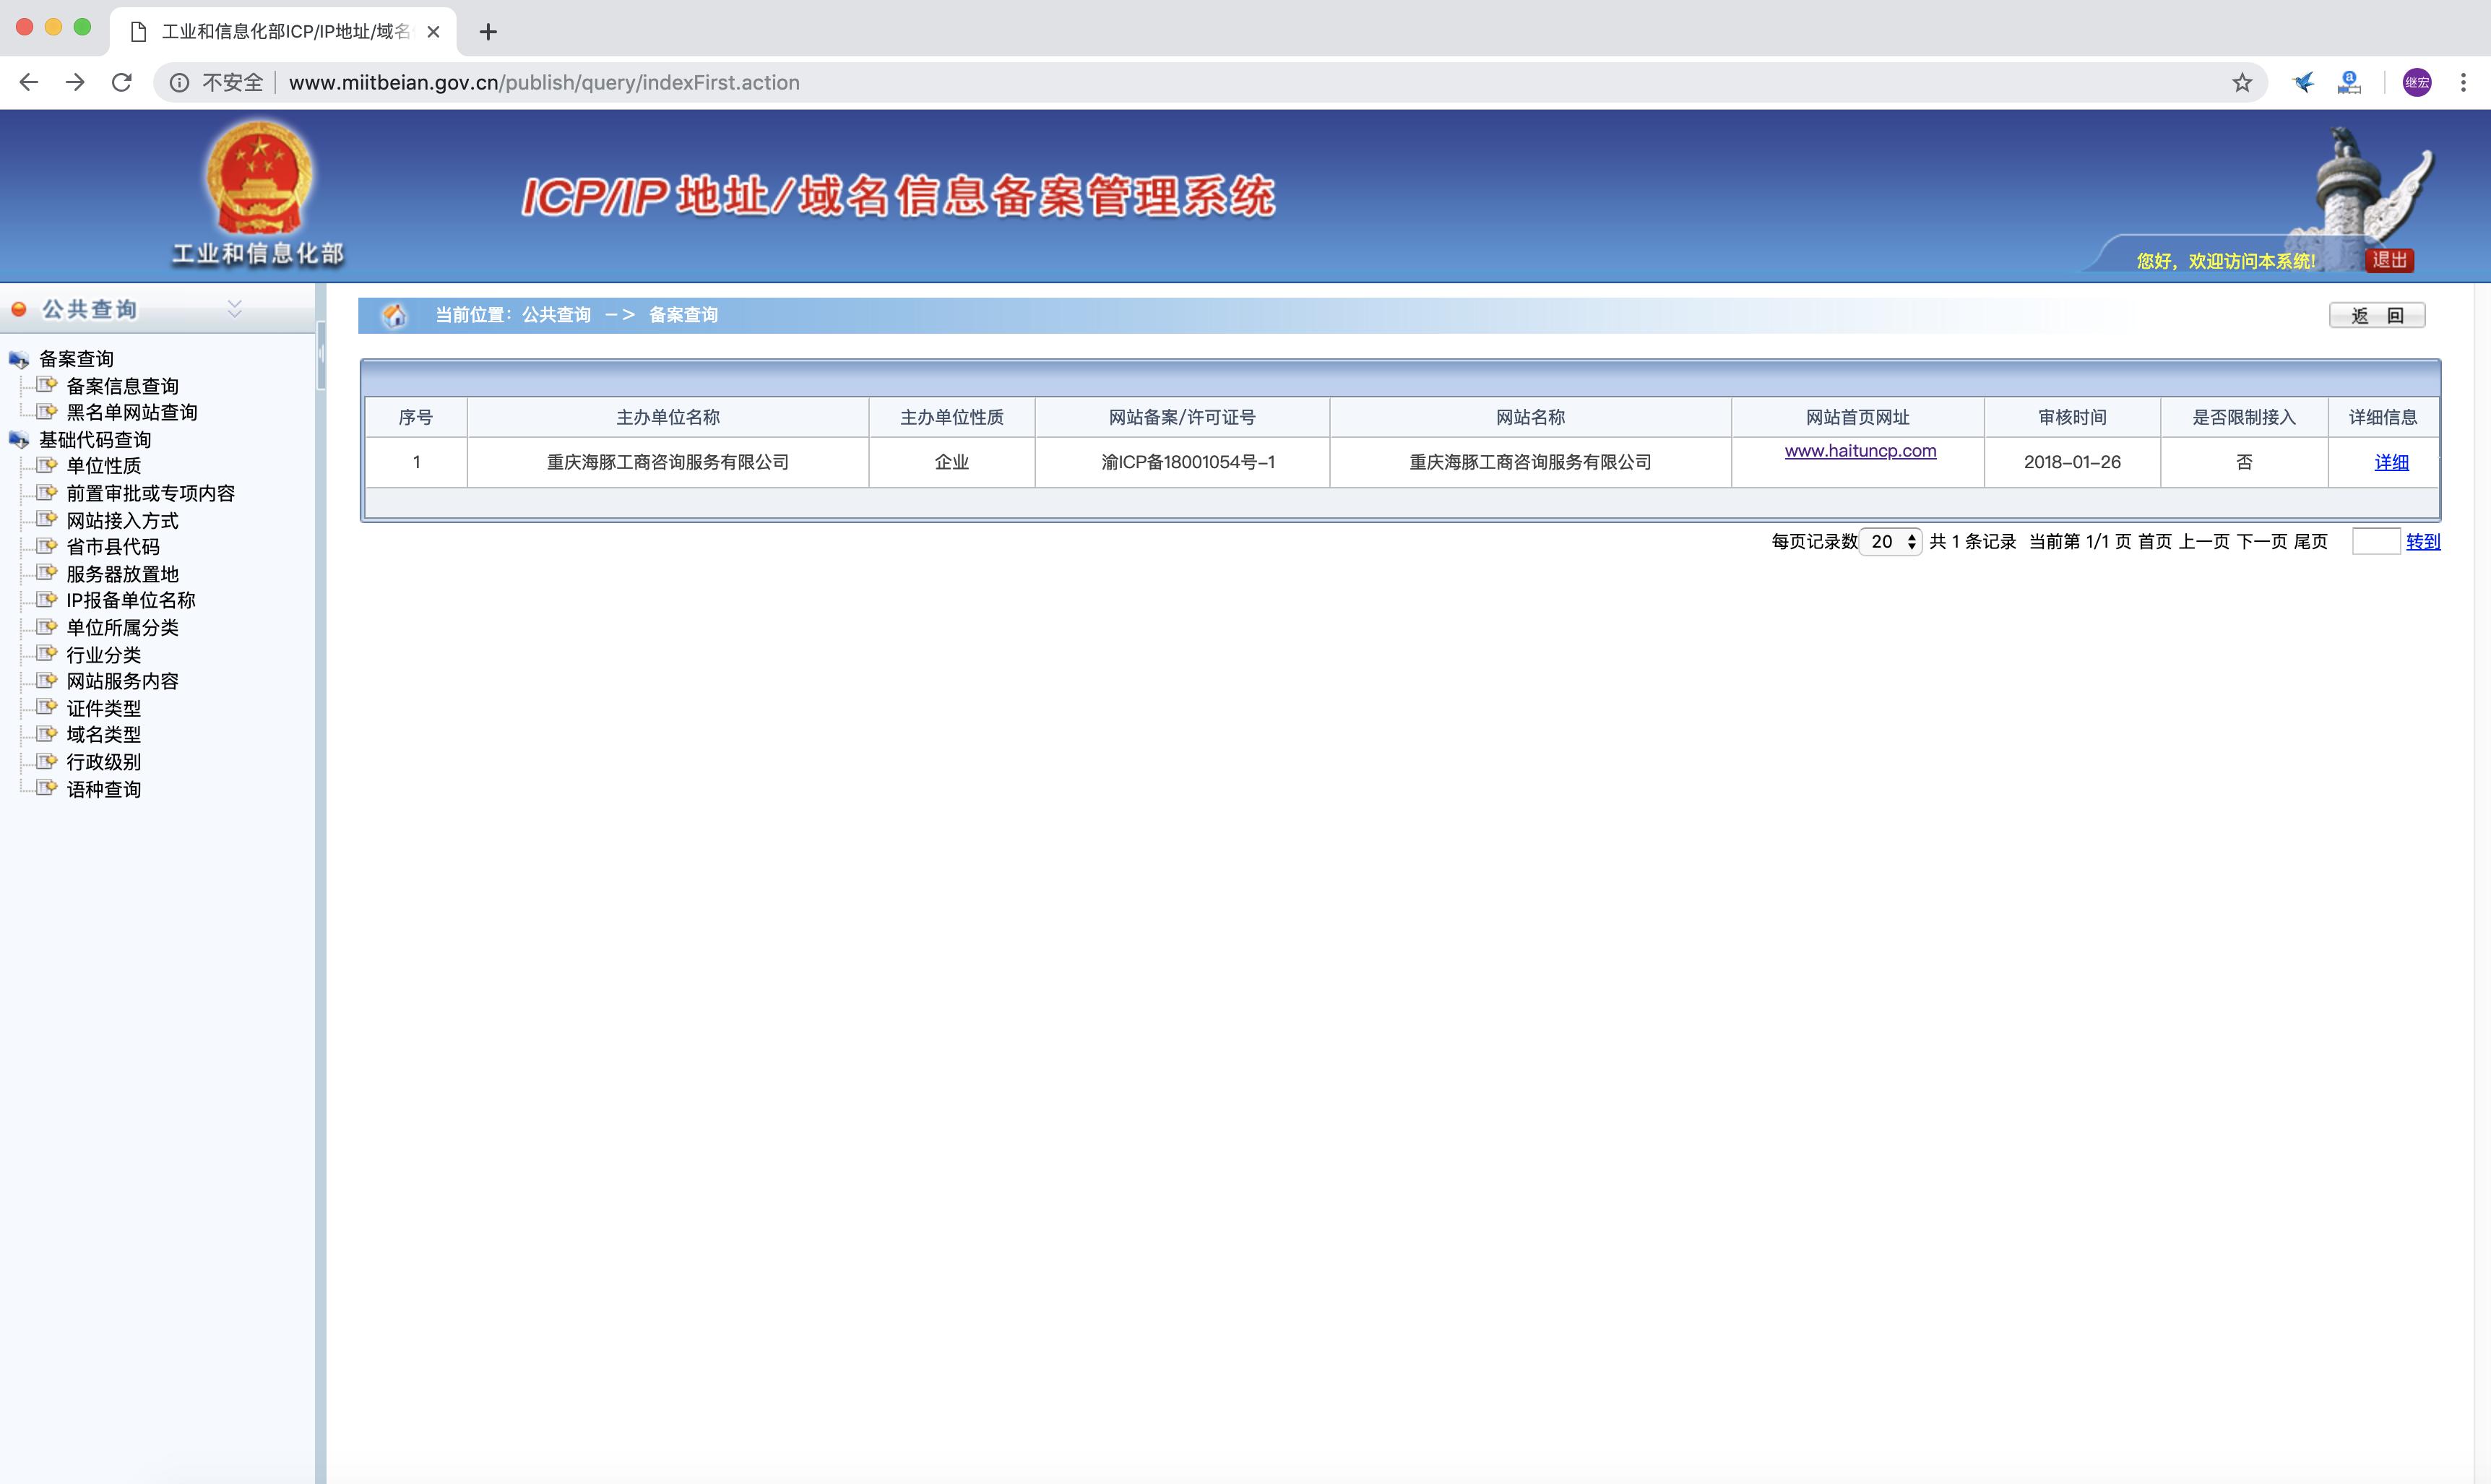 屏幕快照 2019-03-05 10.05.22.png